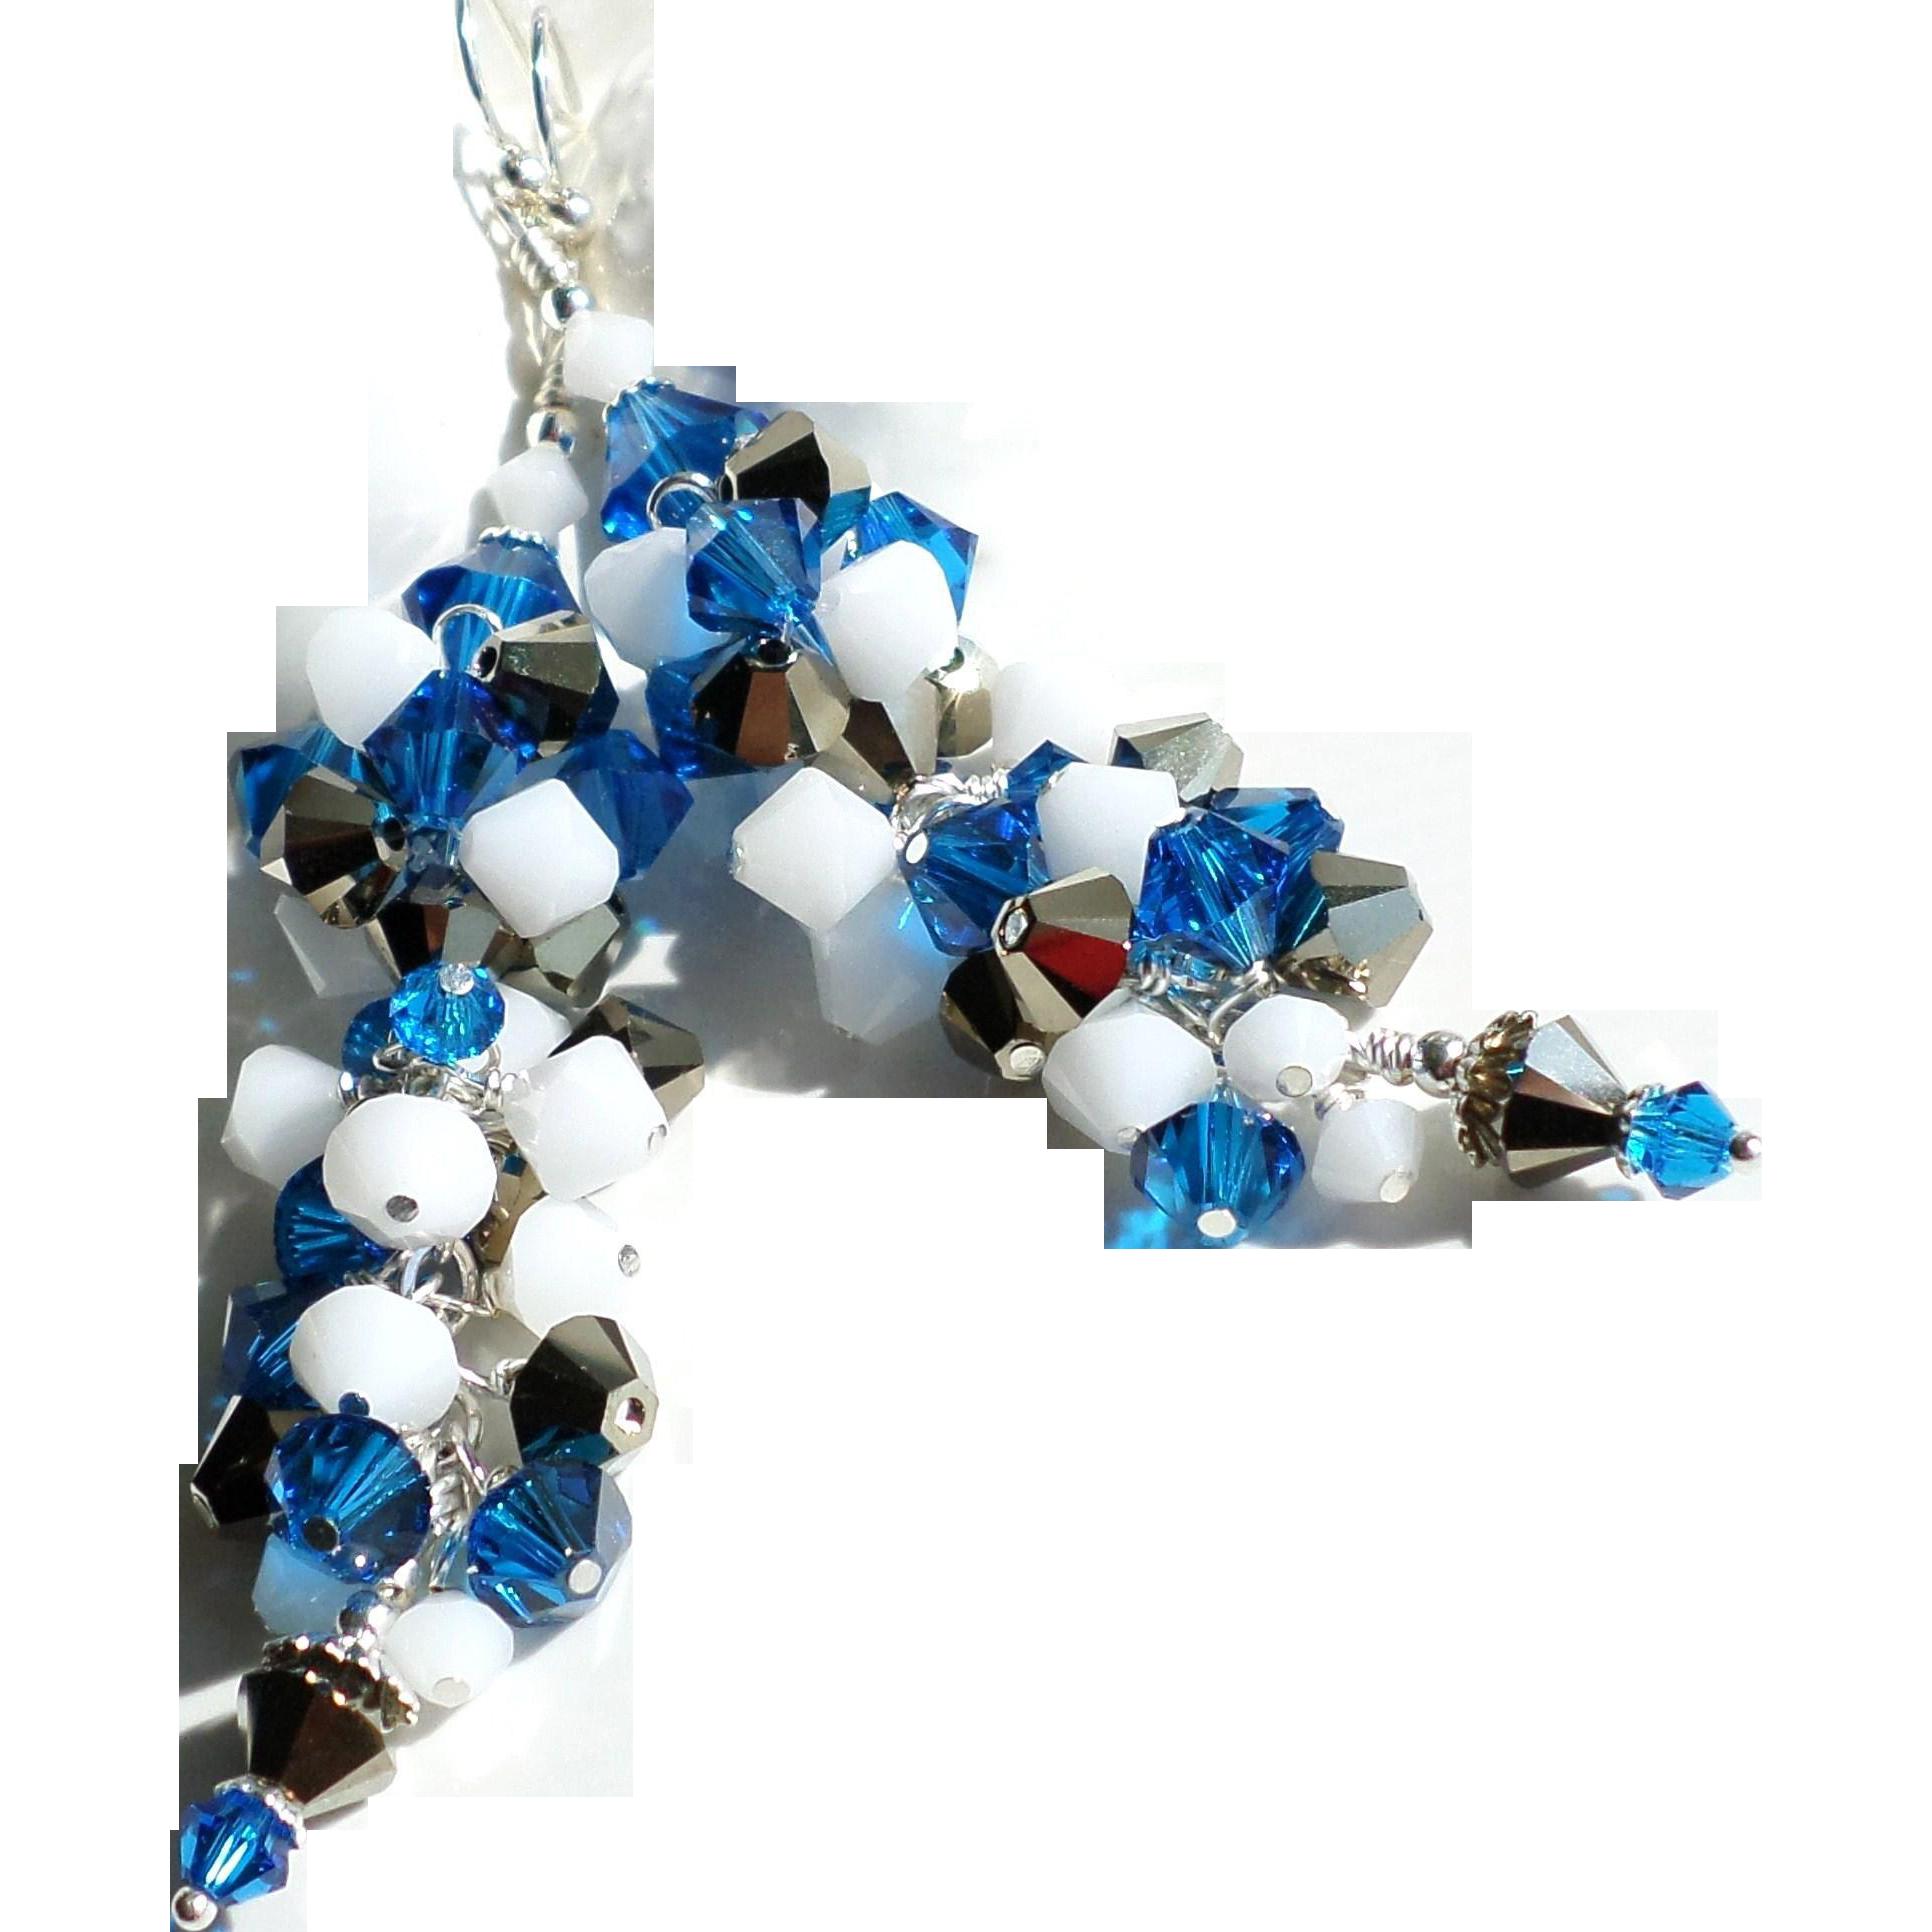 Swarovski Crystal Cluster Bead Long Earrings In Capri Blue, Bronze and White Shades